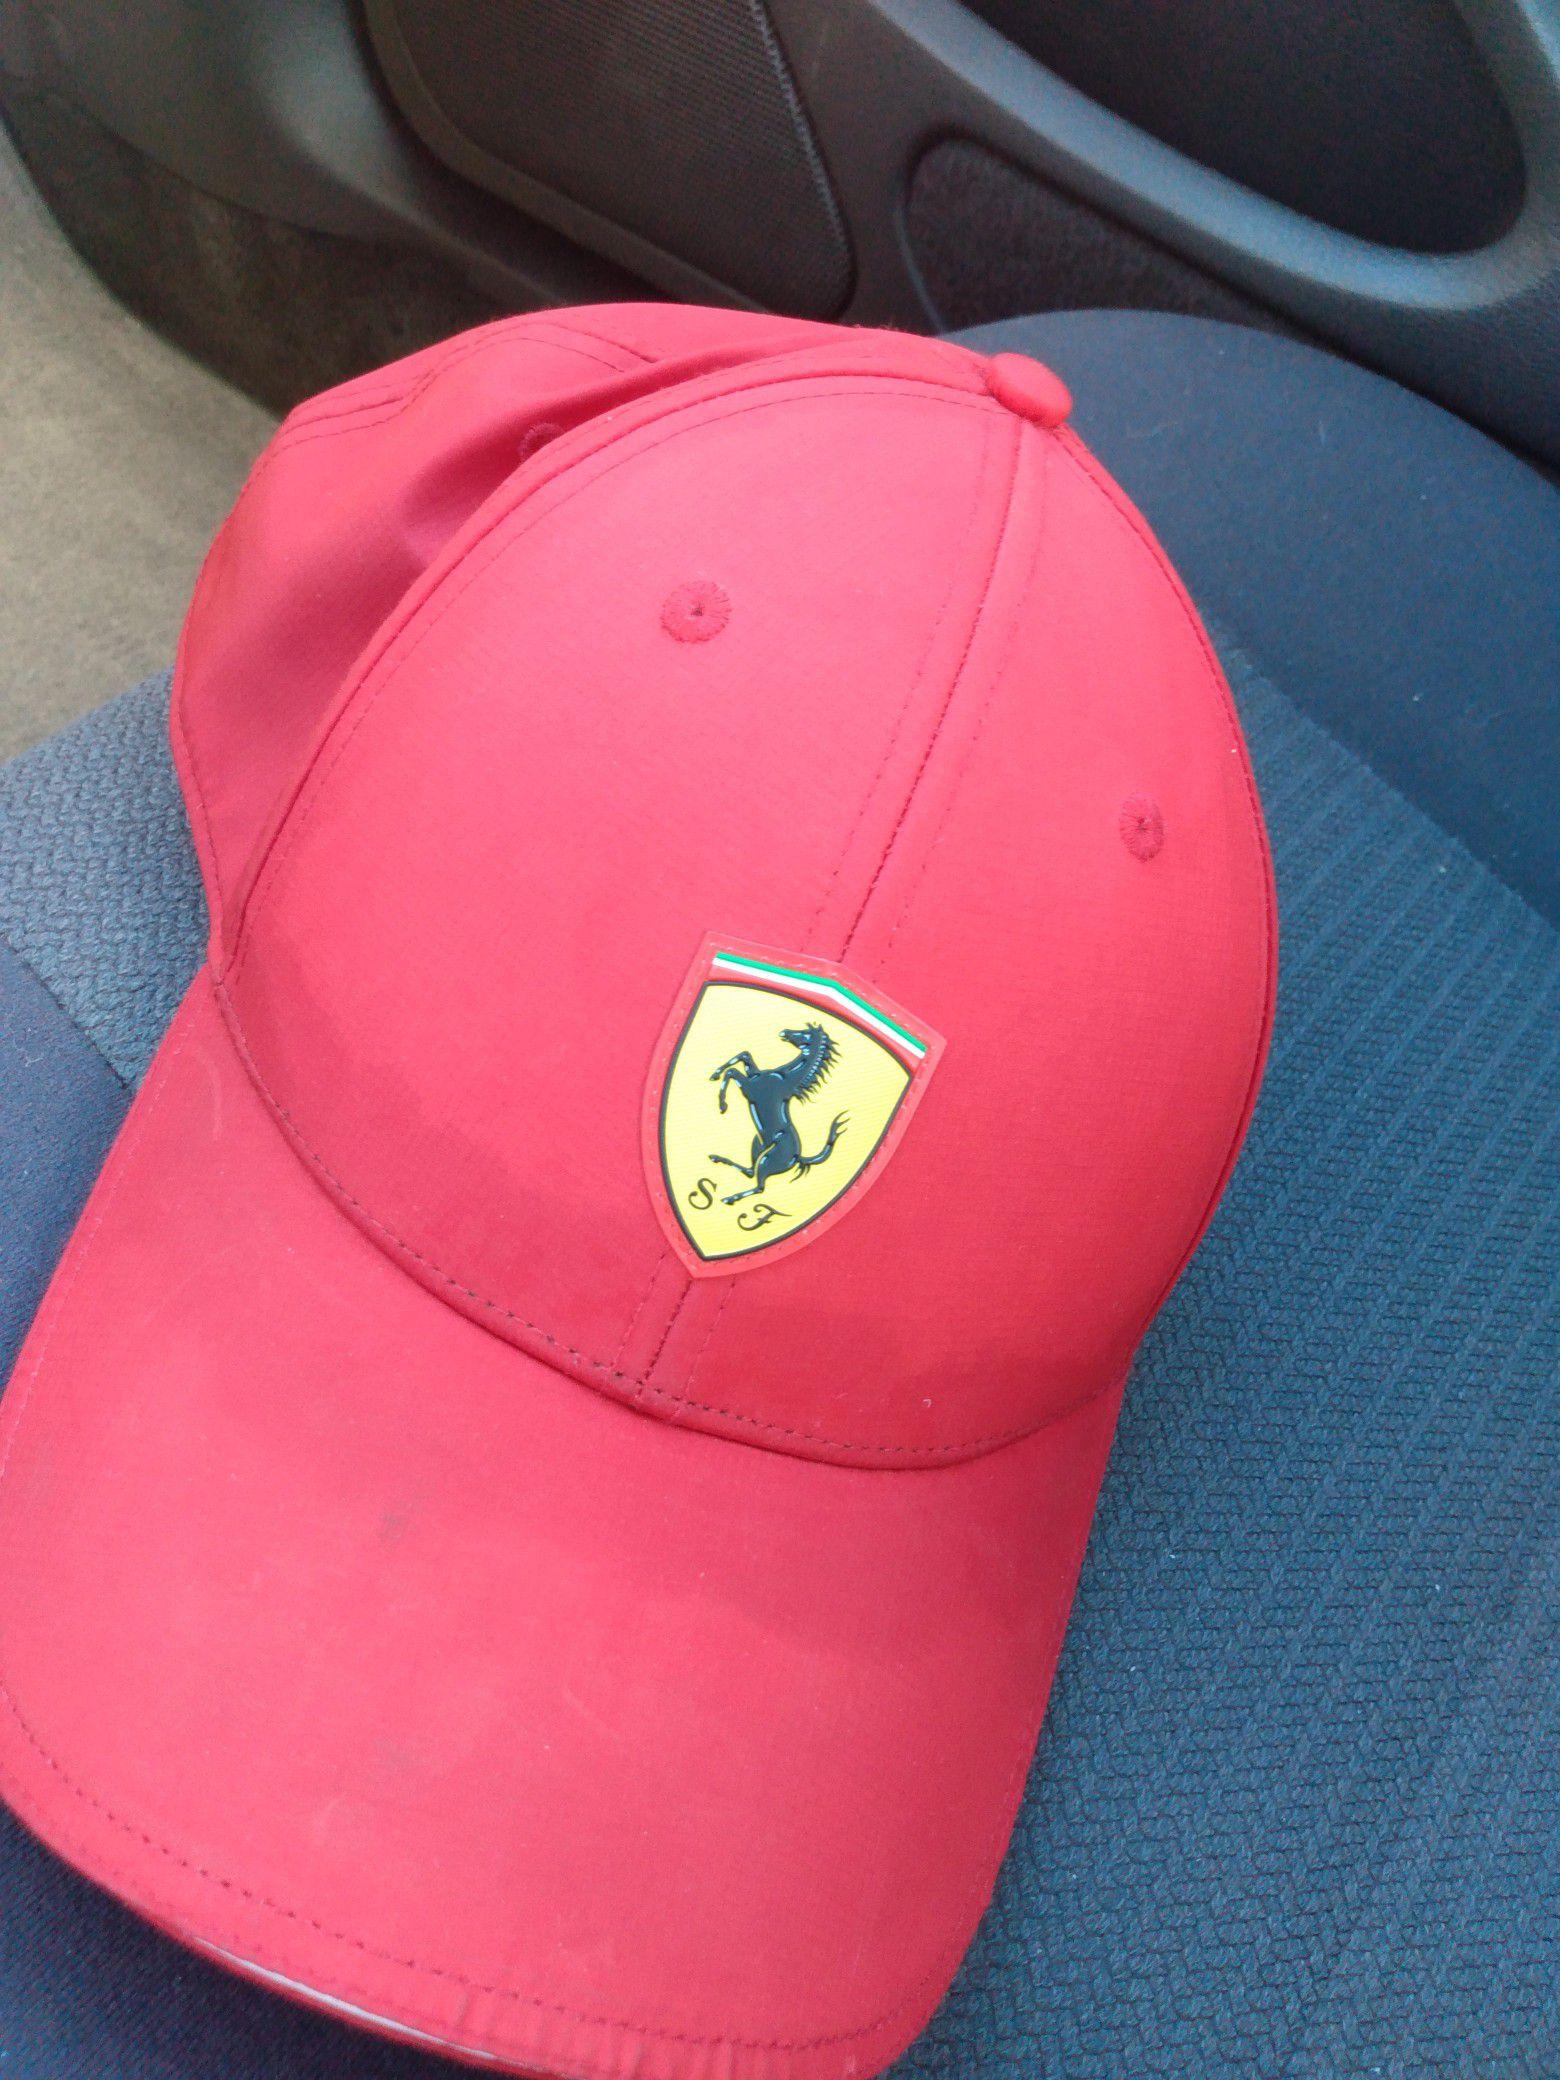 Official Ferrari hat